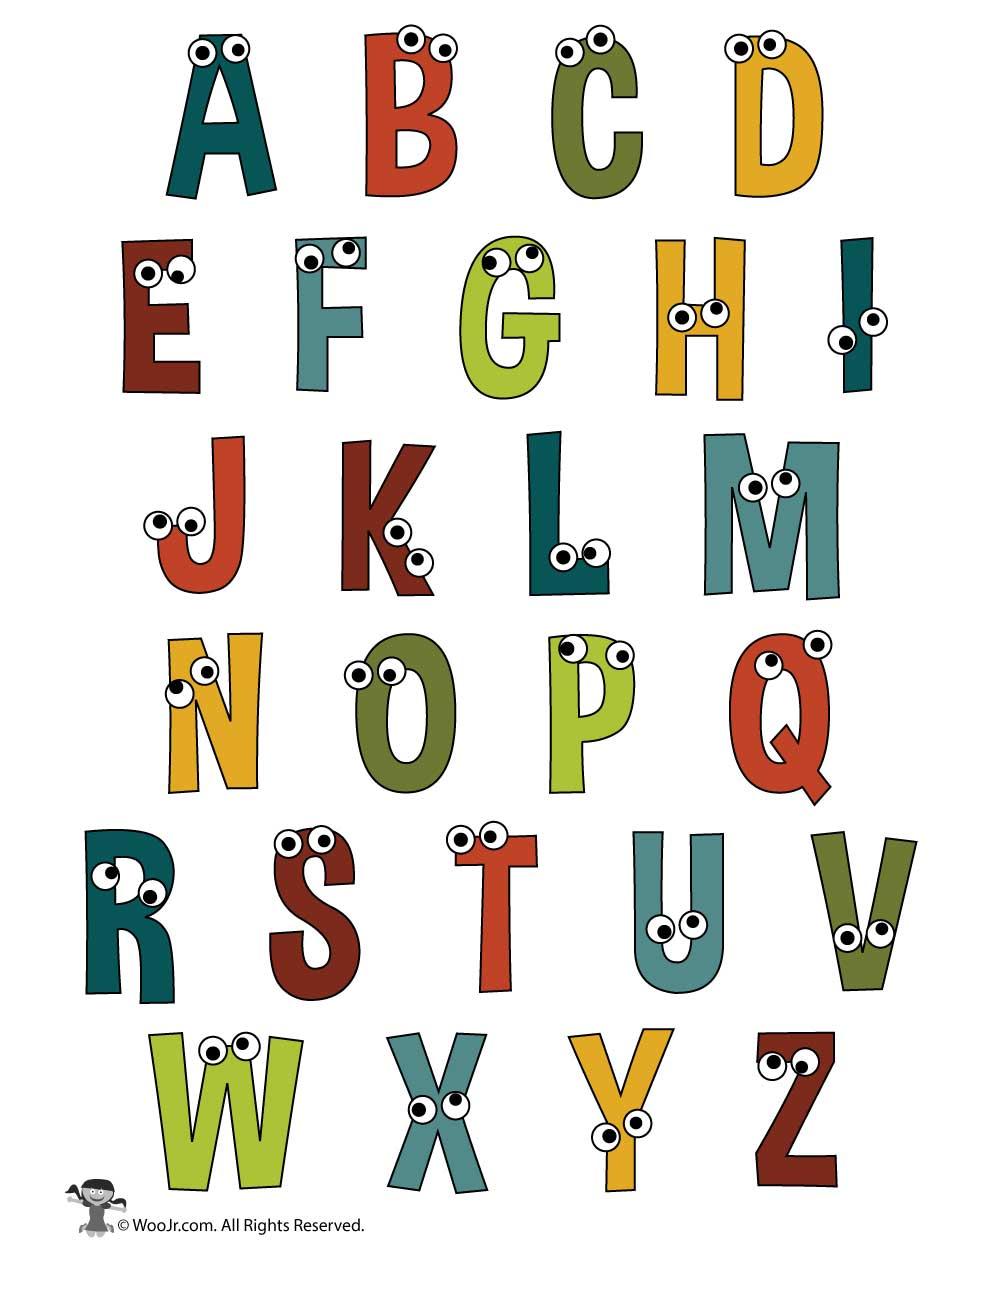 The Art Of Woo PDF Free Download